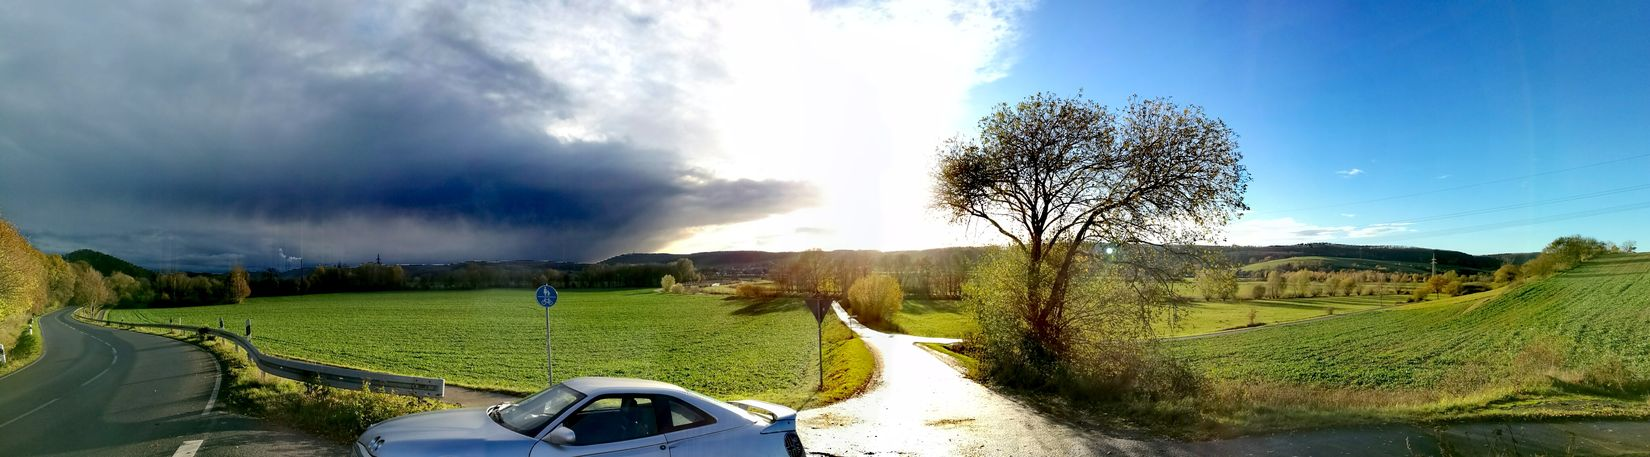 Grass Sky Nature Cloud - Sky Tree Outdoors No People Beauty In Nature Day Car Alfa Romeo Gtv Nature Tree